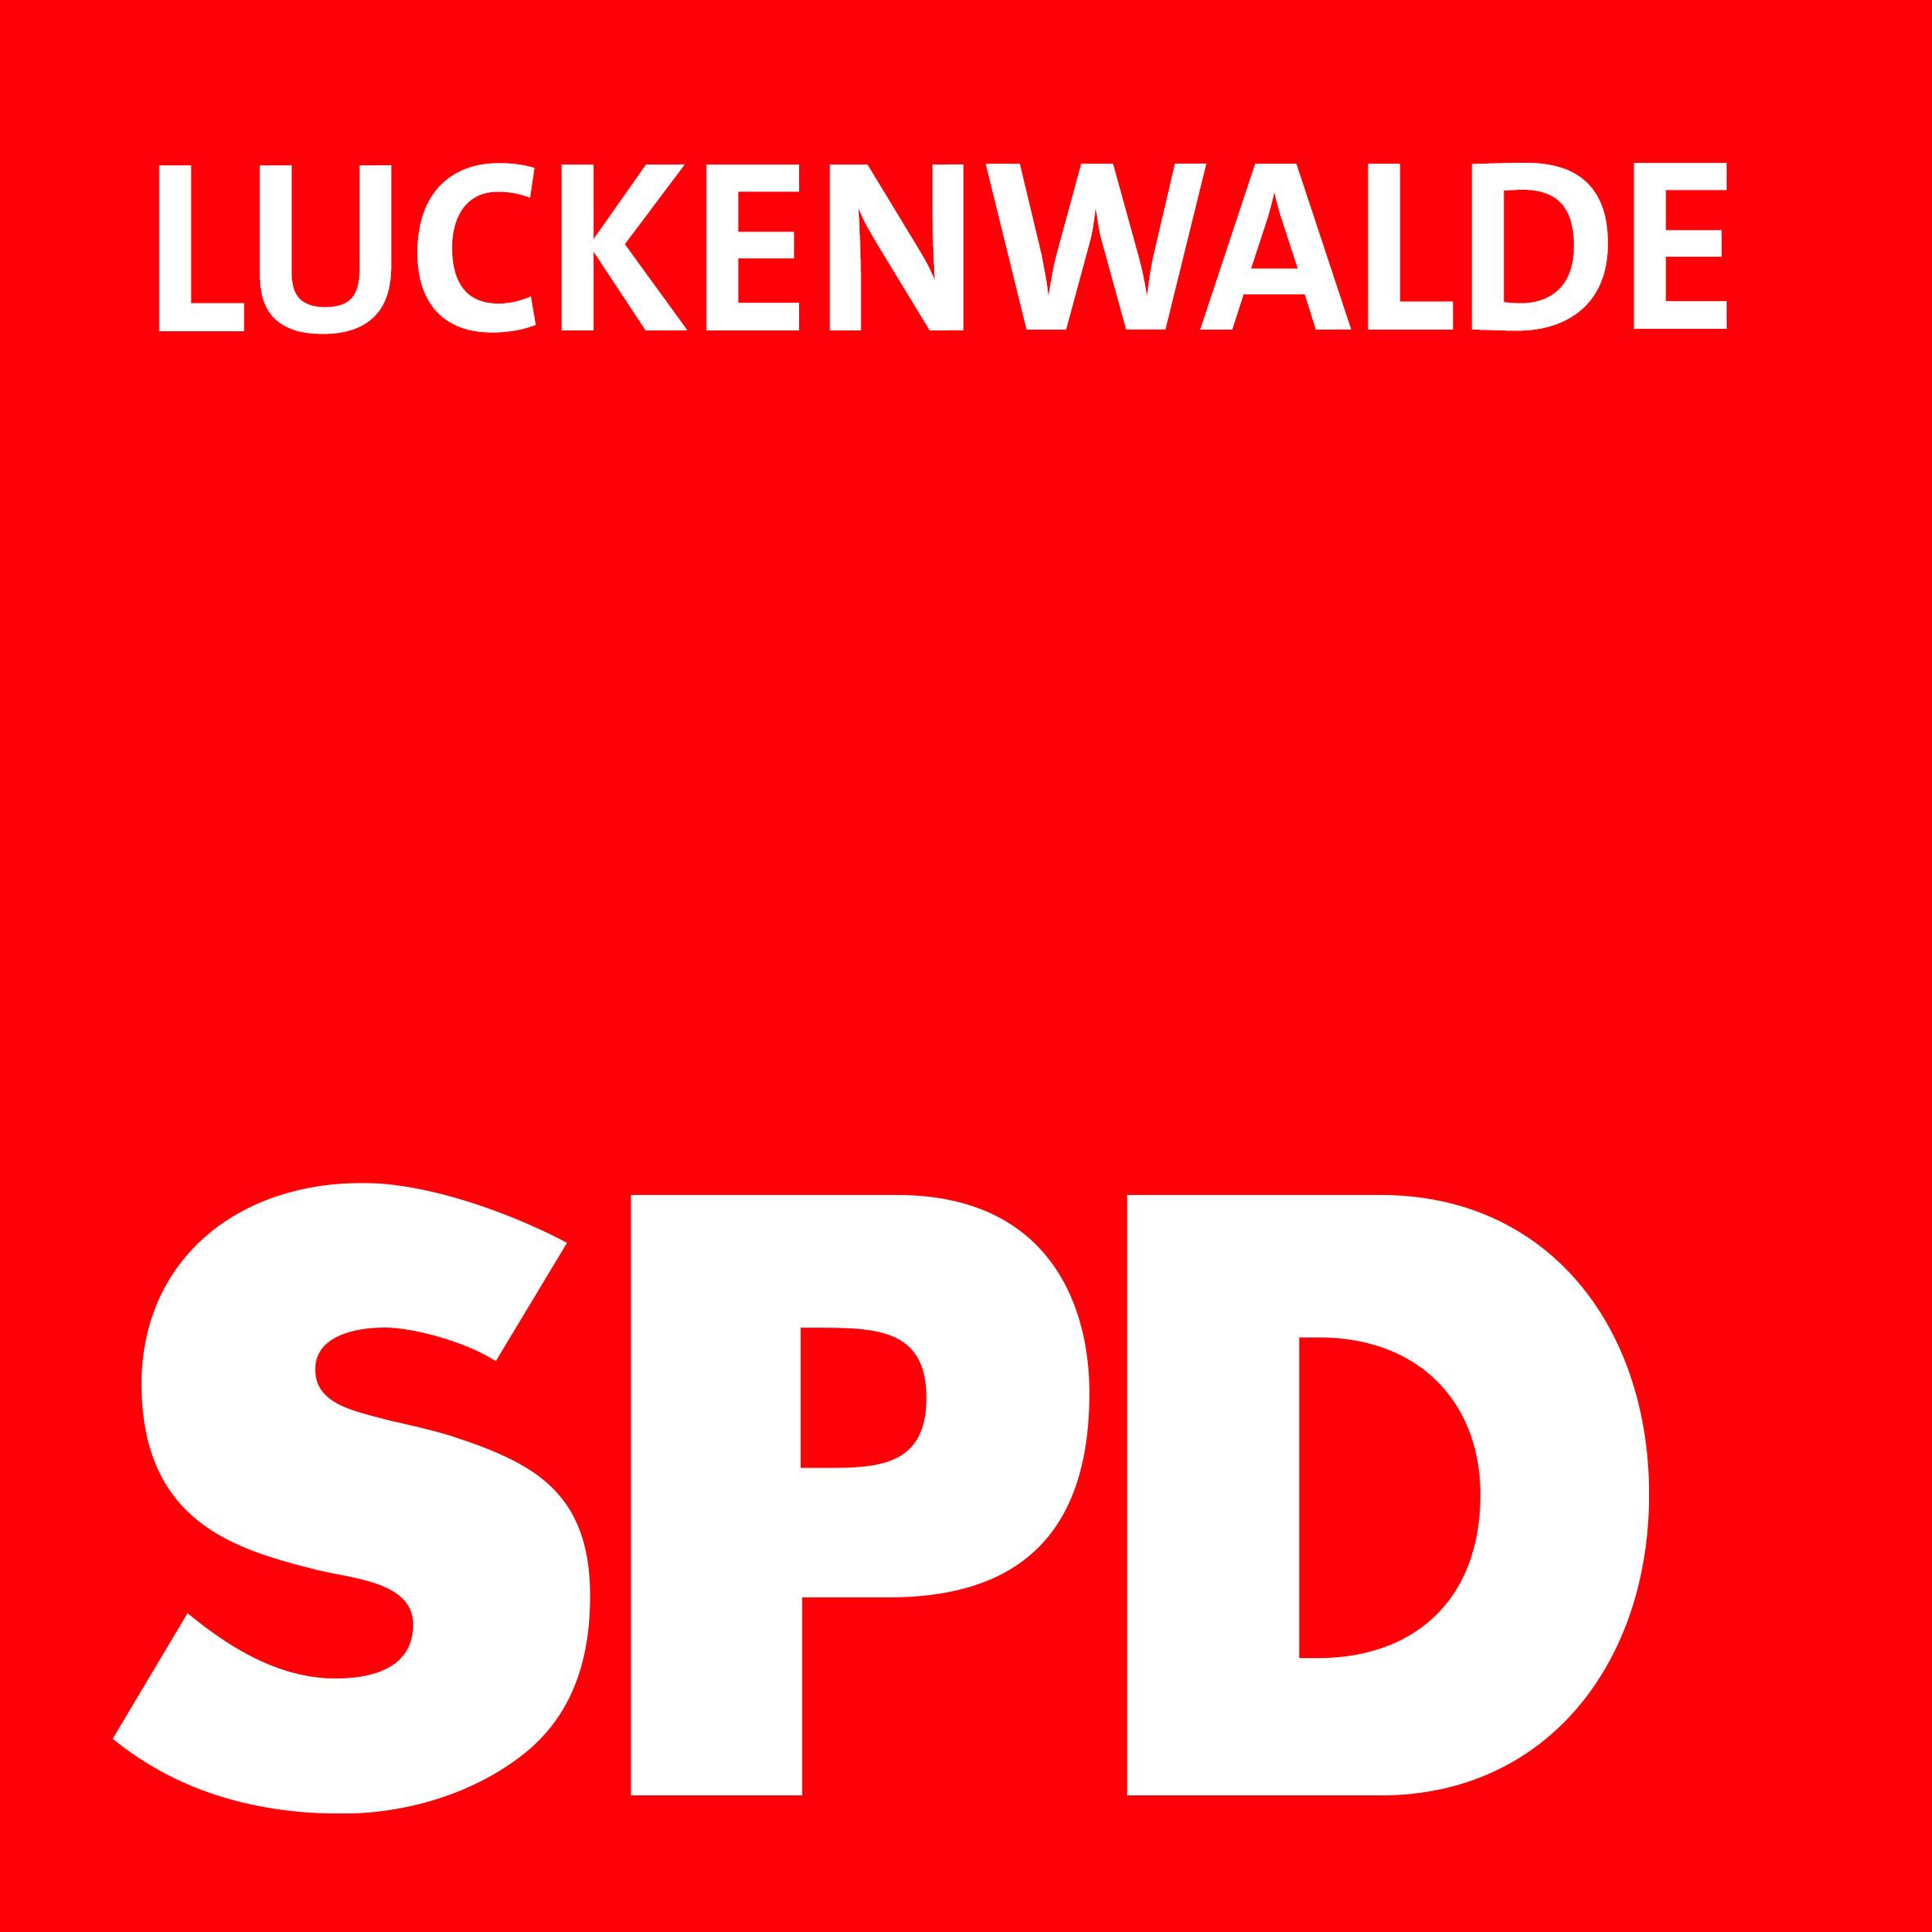 SPD Luckenwalde